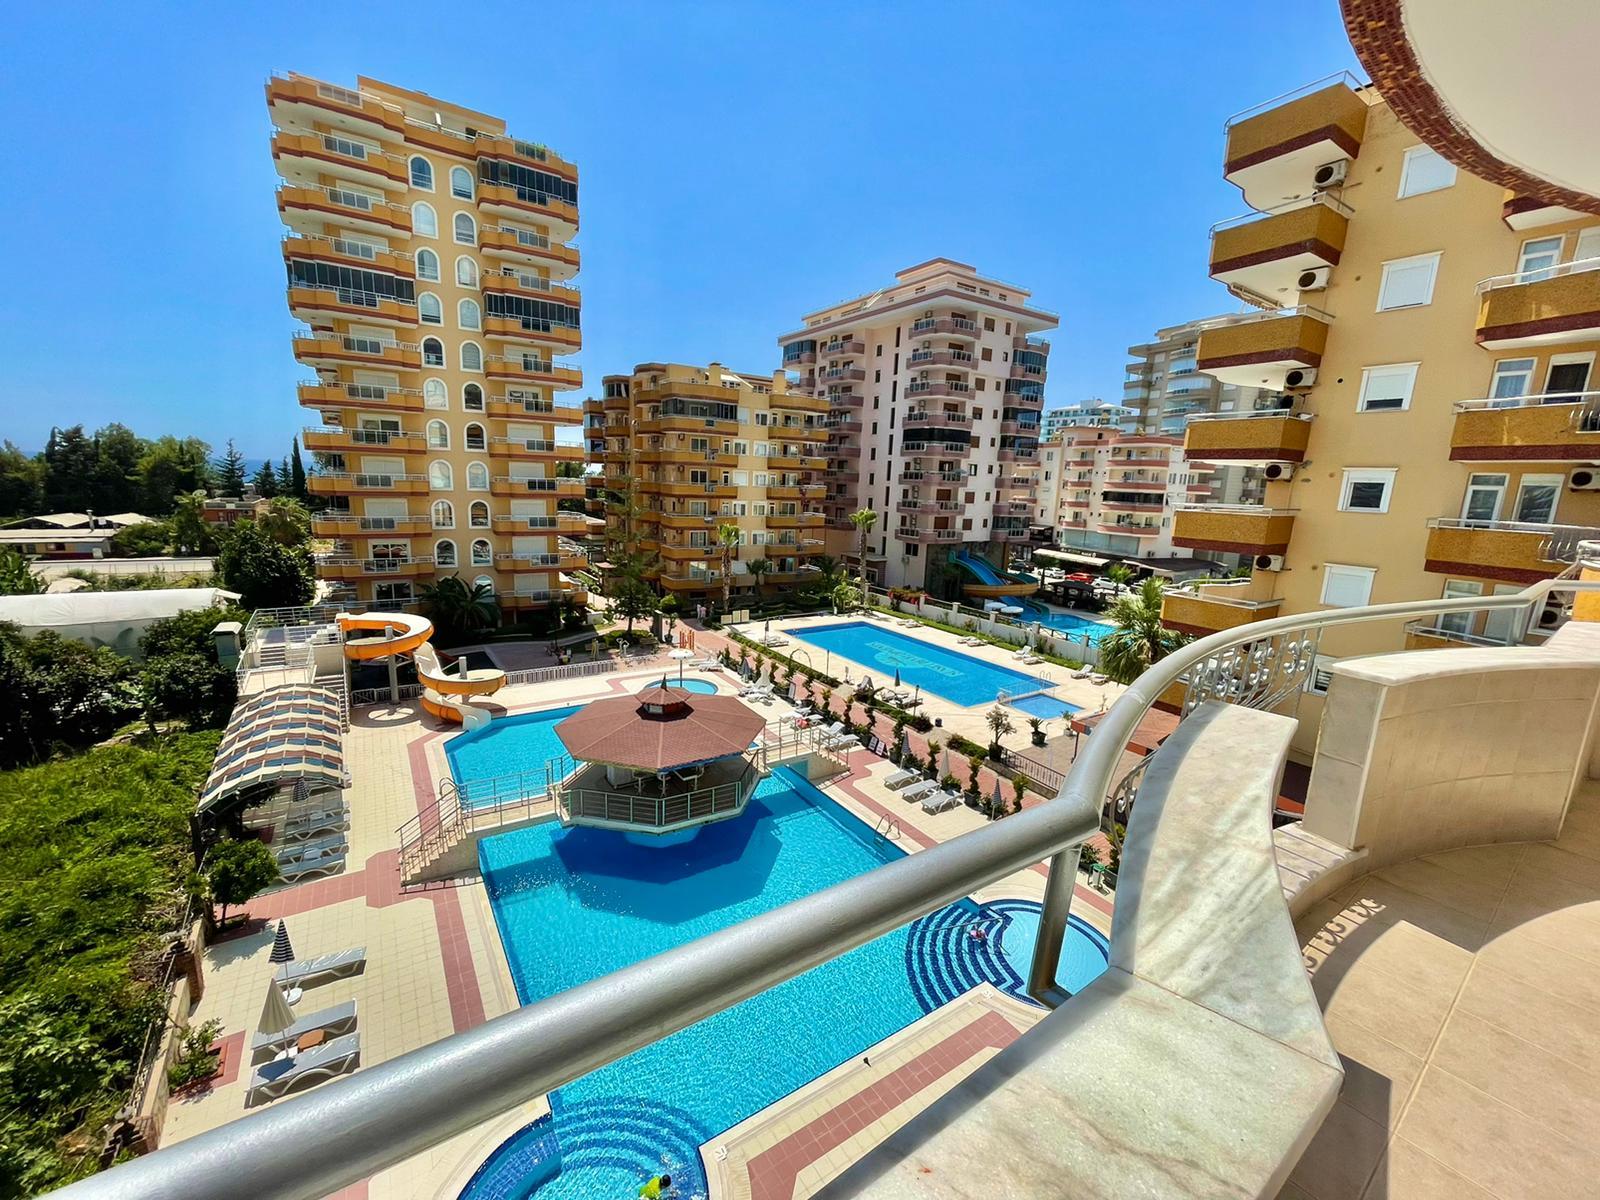 Трёхкомнатная квартира в «двух шагах» от Средиземного моря - Фото 28